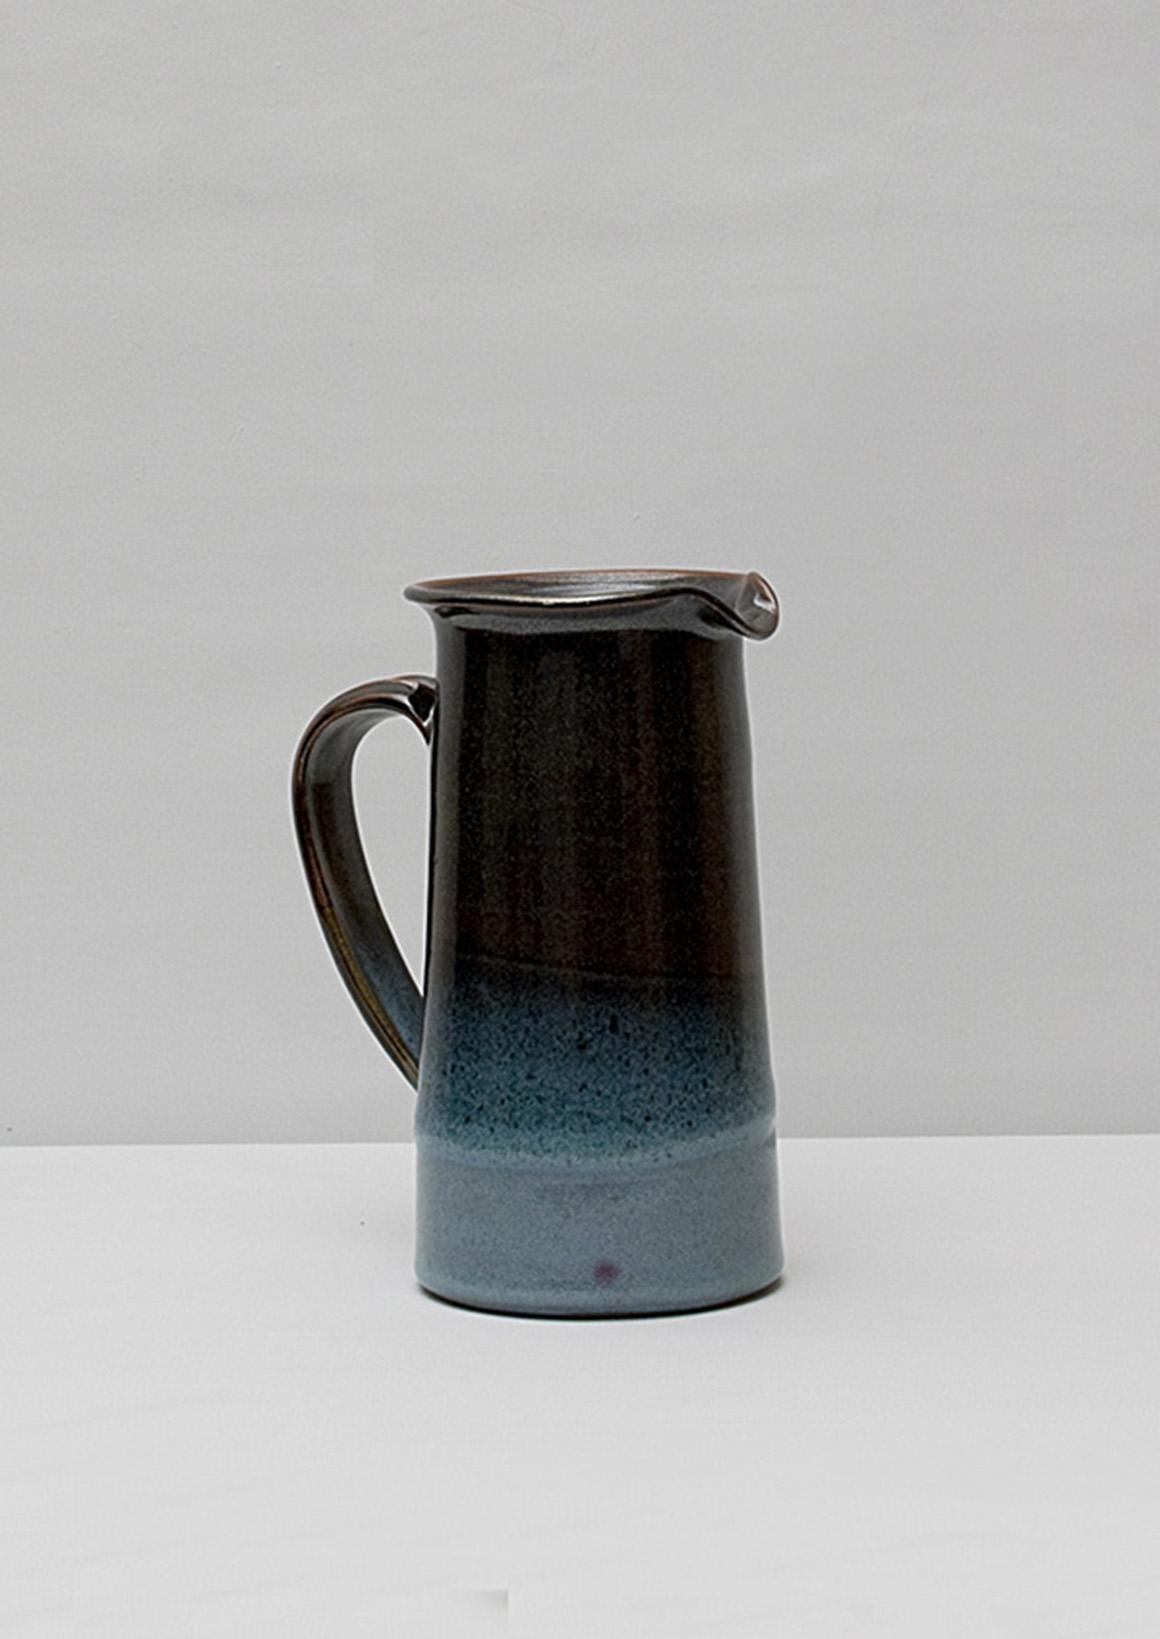 Carafe en grès, brun et bleu